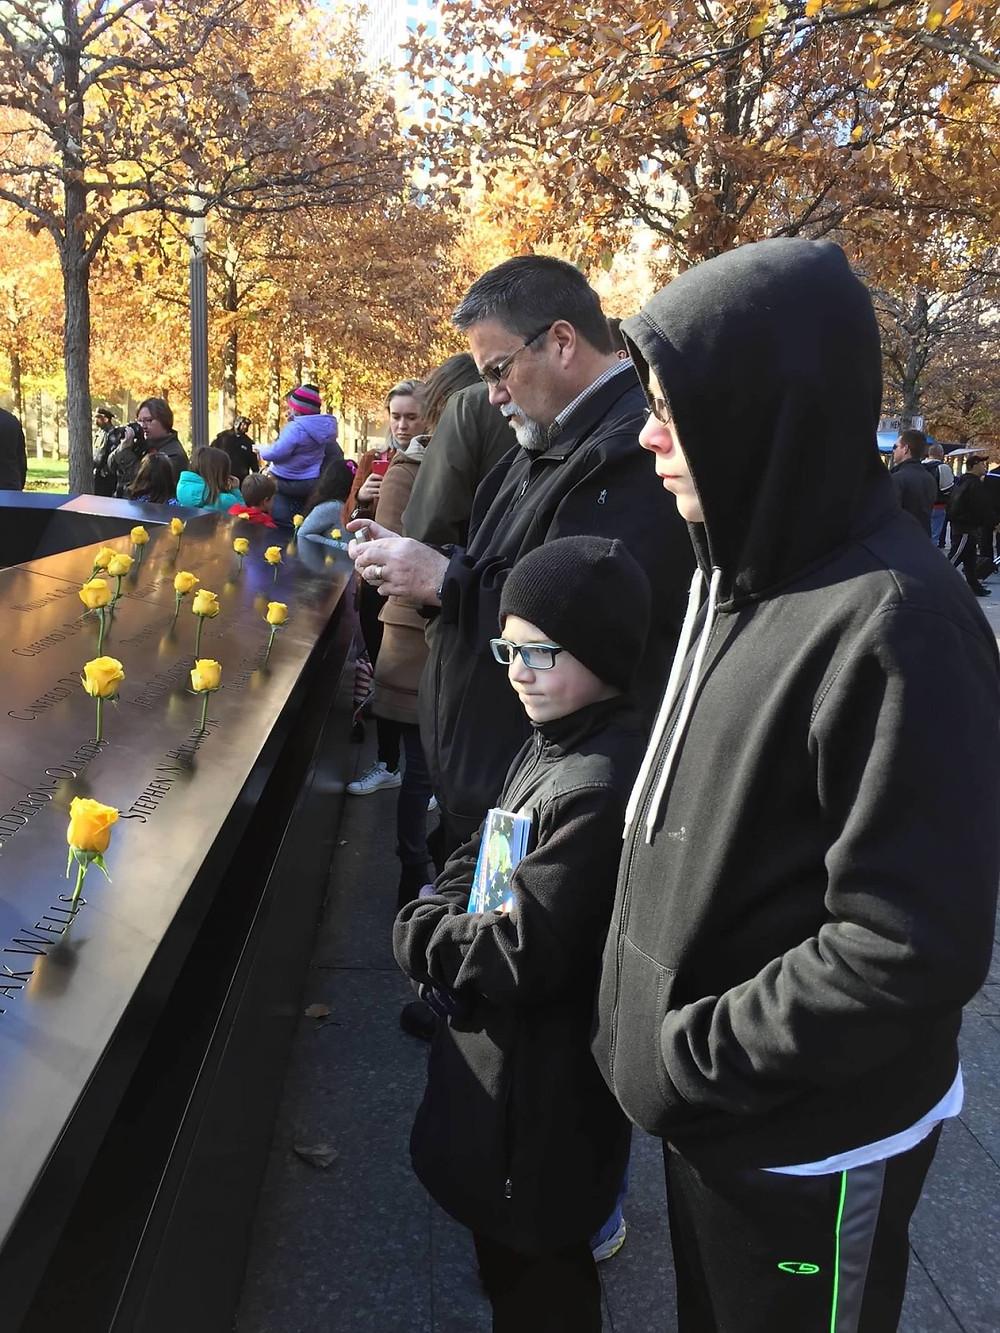 A photo of david brodosi and his family at the Trade Center Memorial